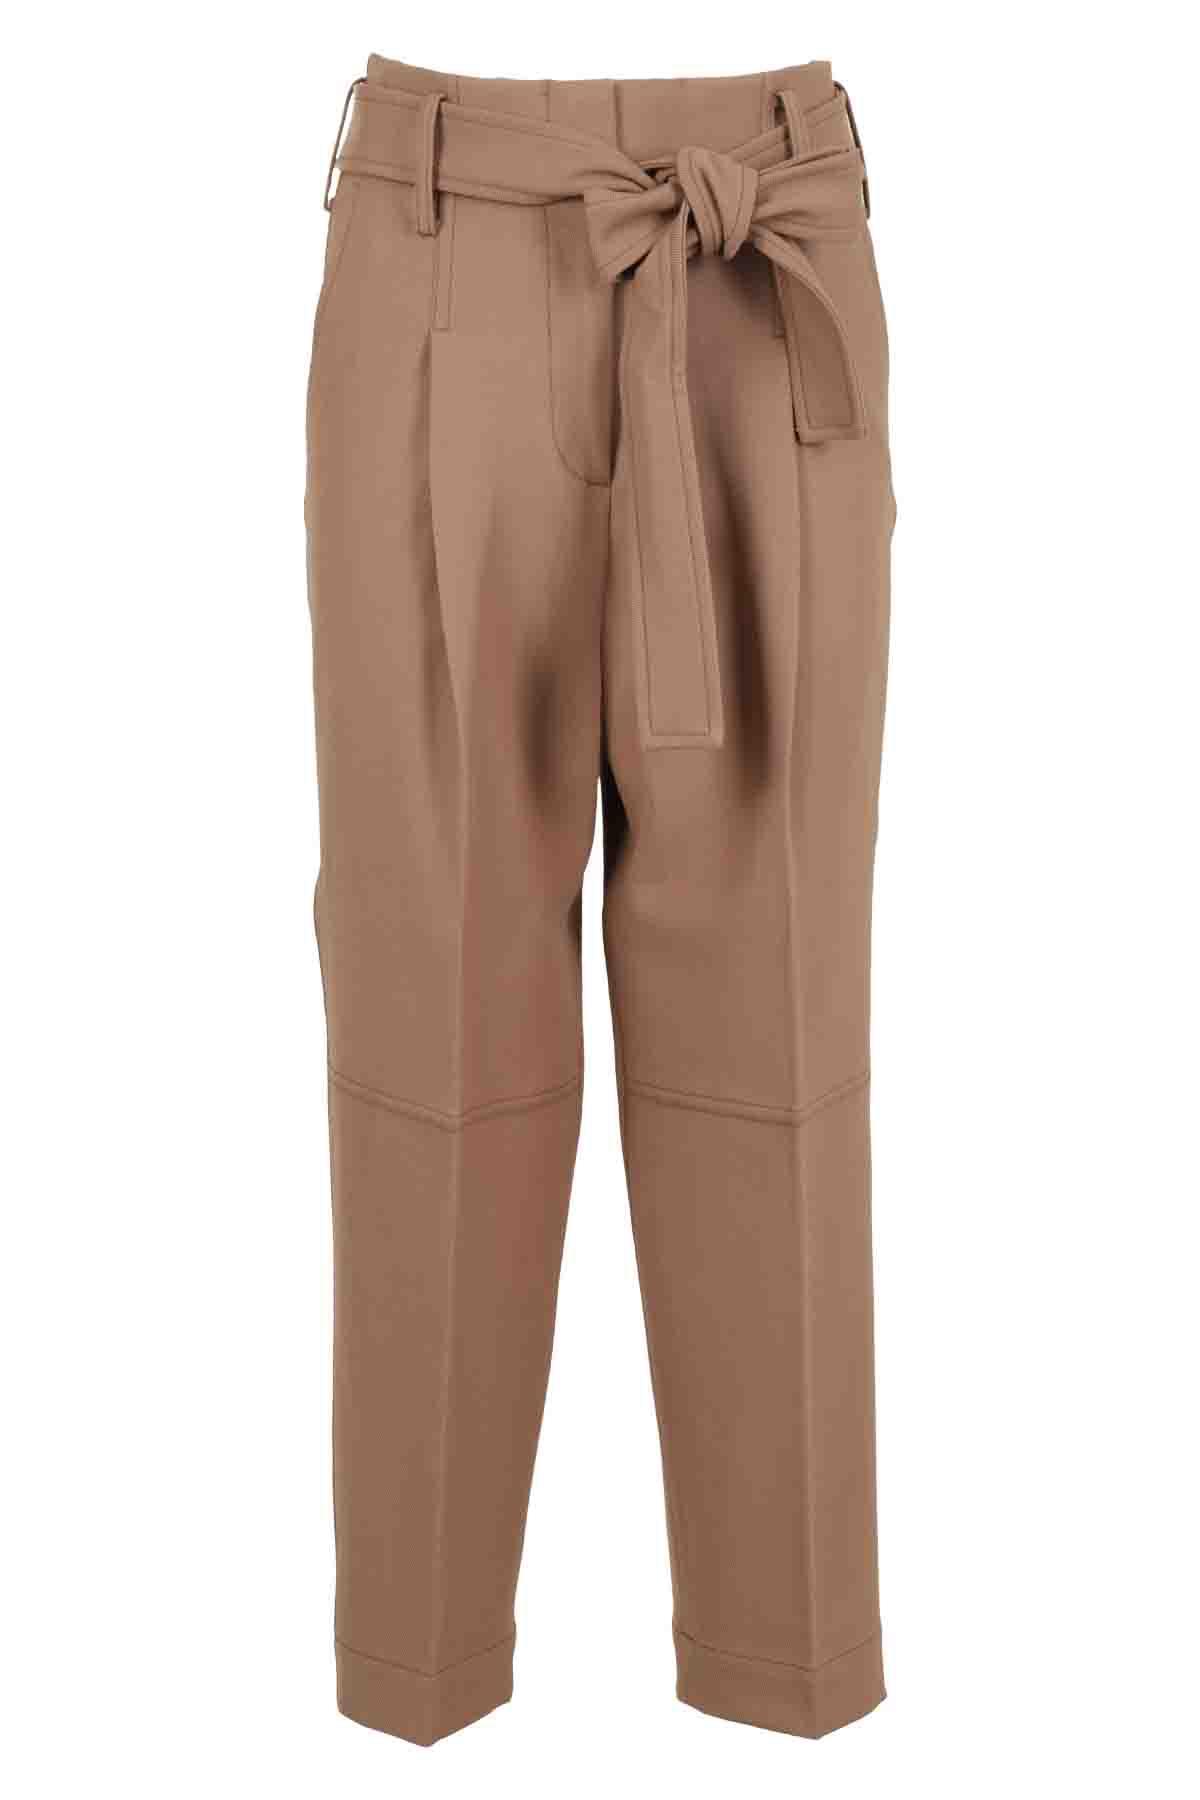 Seventy Trousers